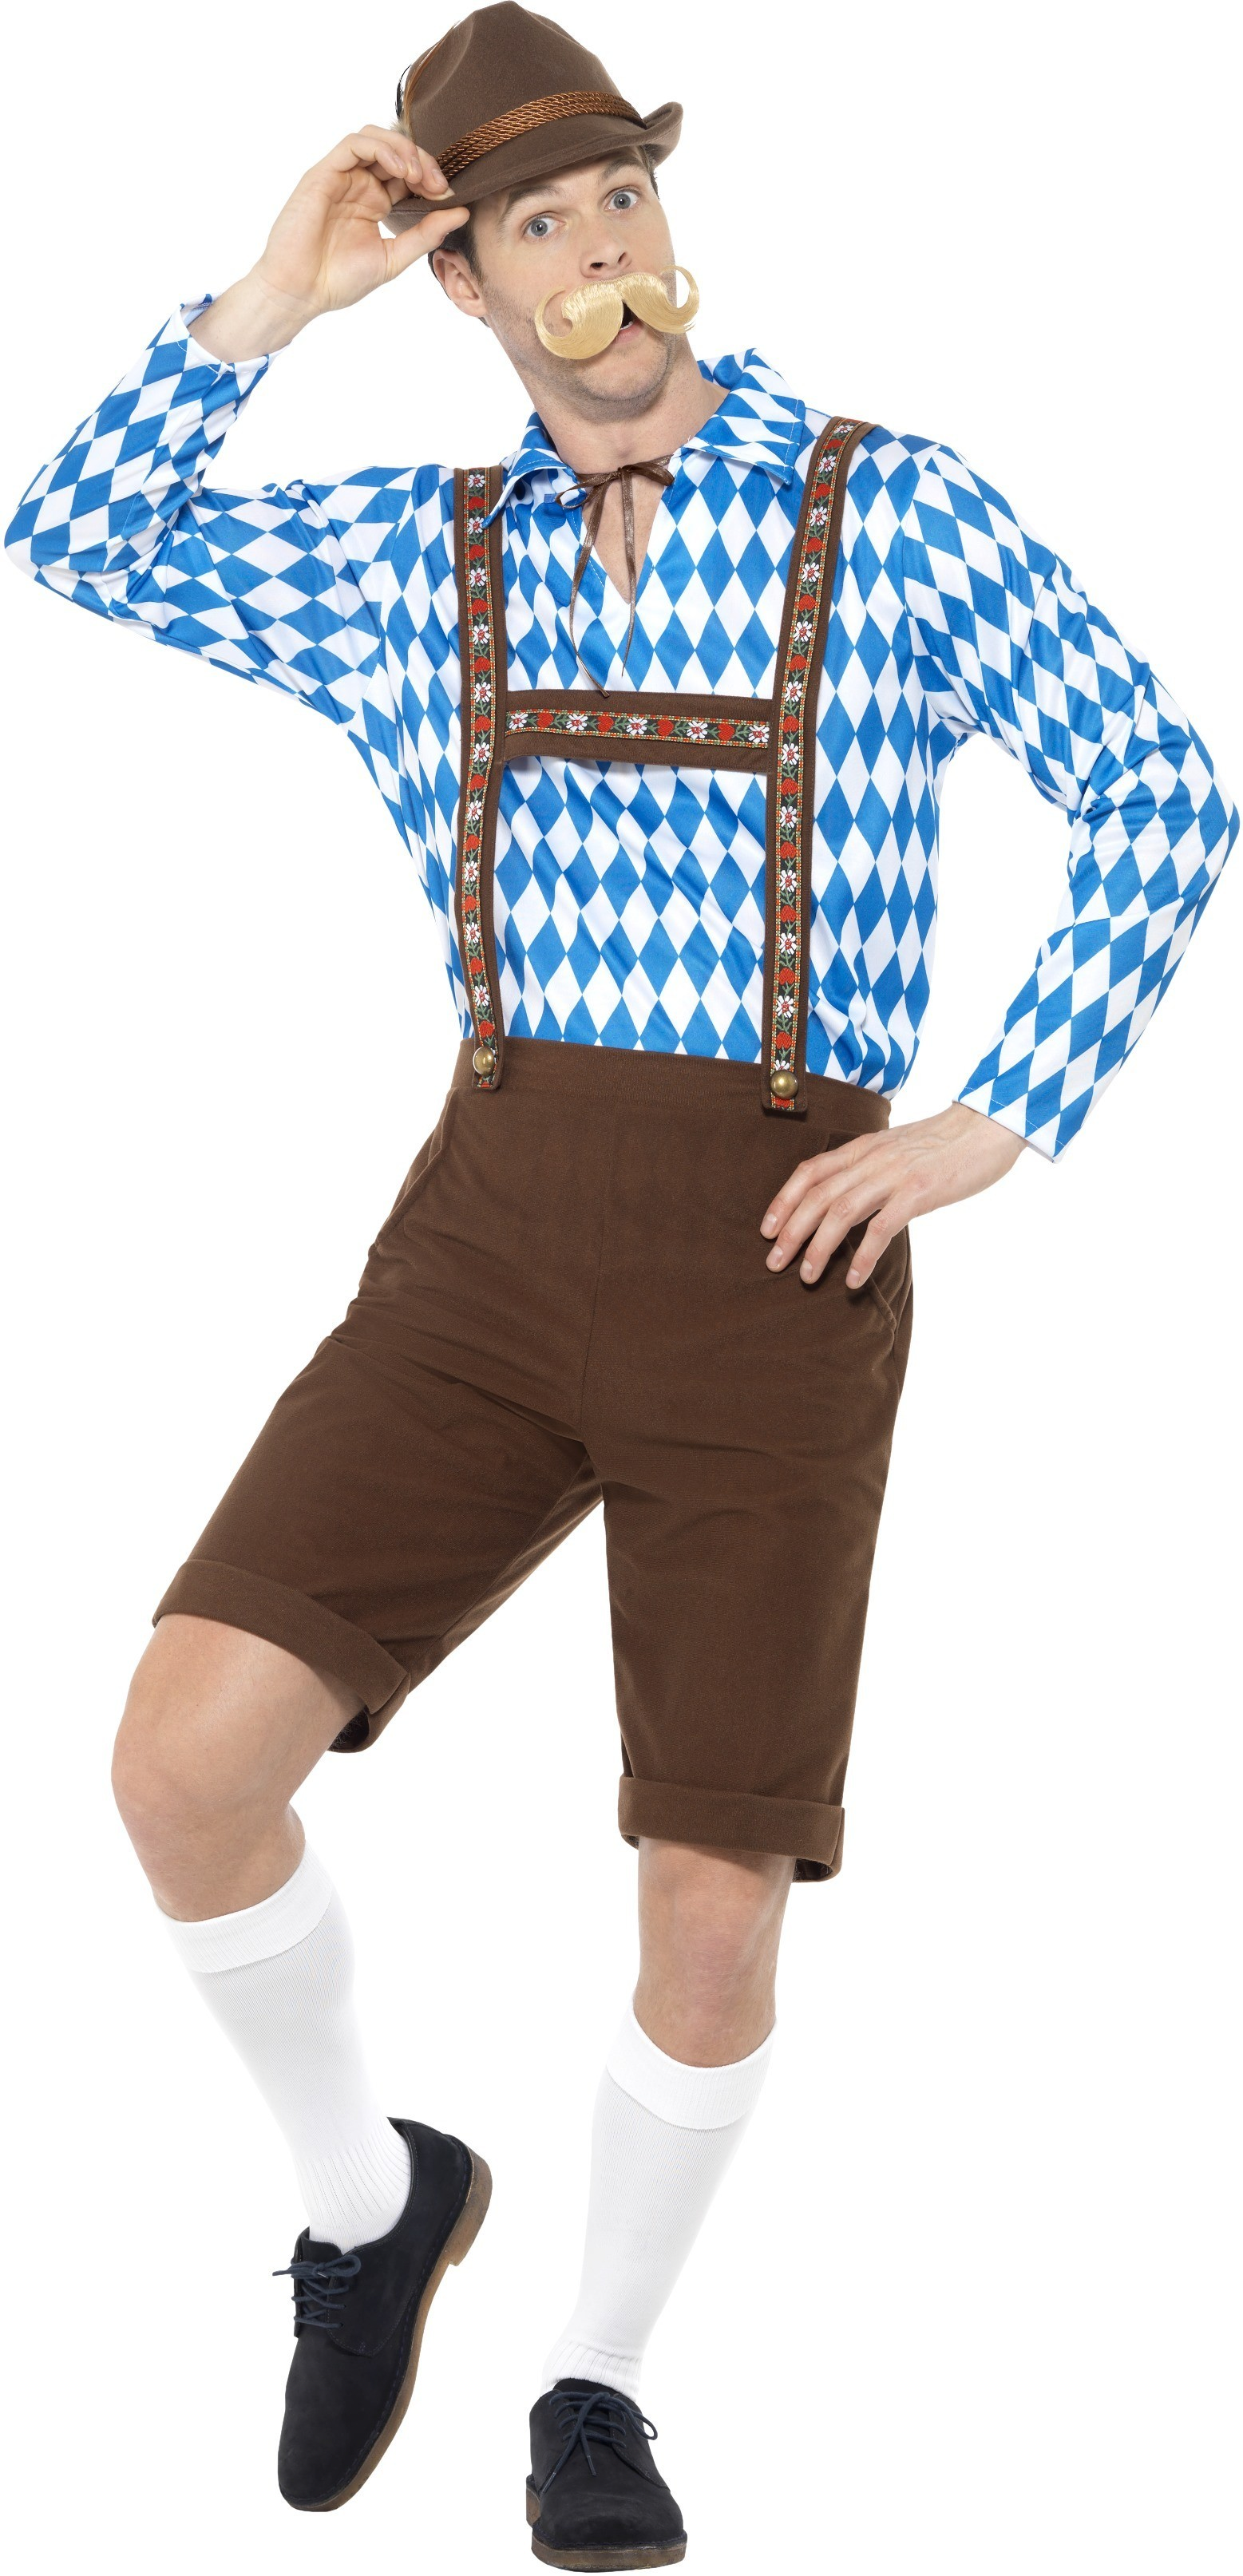 Disfraz de Bávaro Oktoberfest - Disfraces Murillo 15919b57a09f